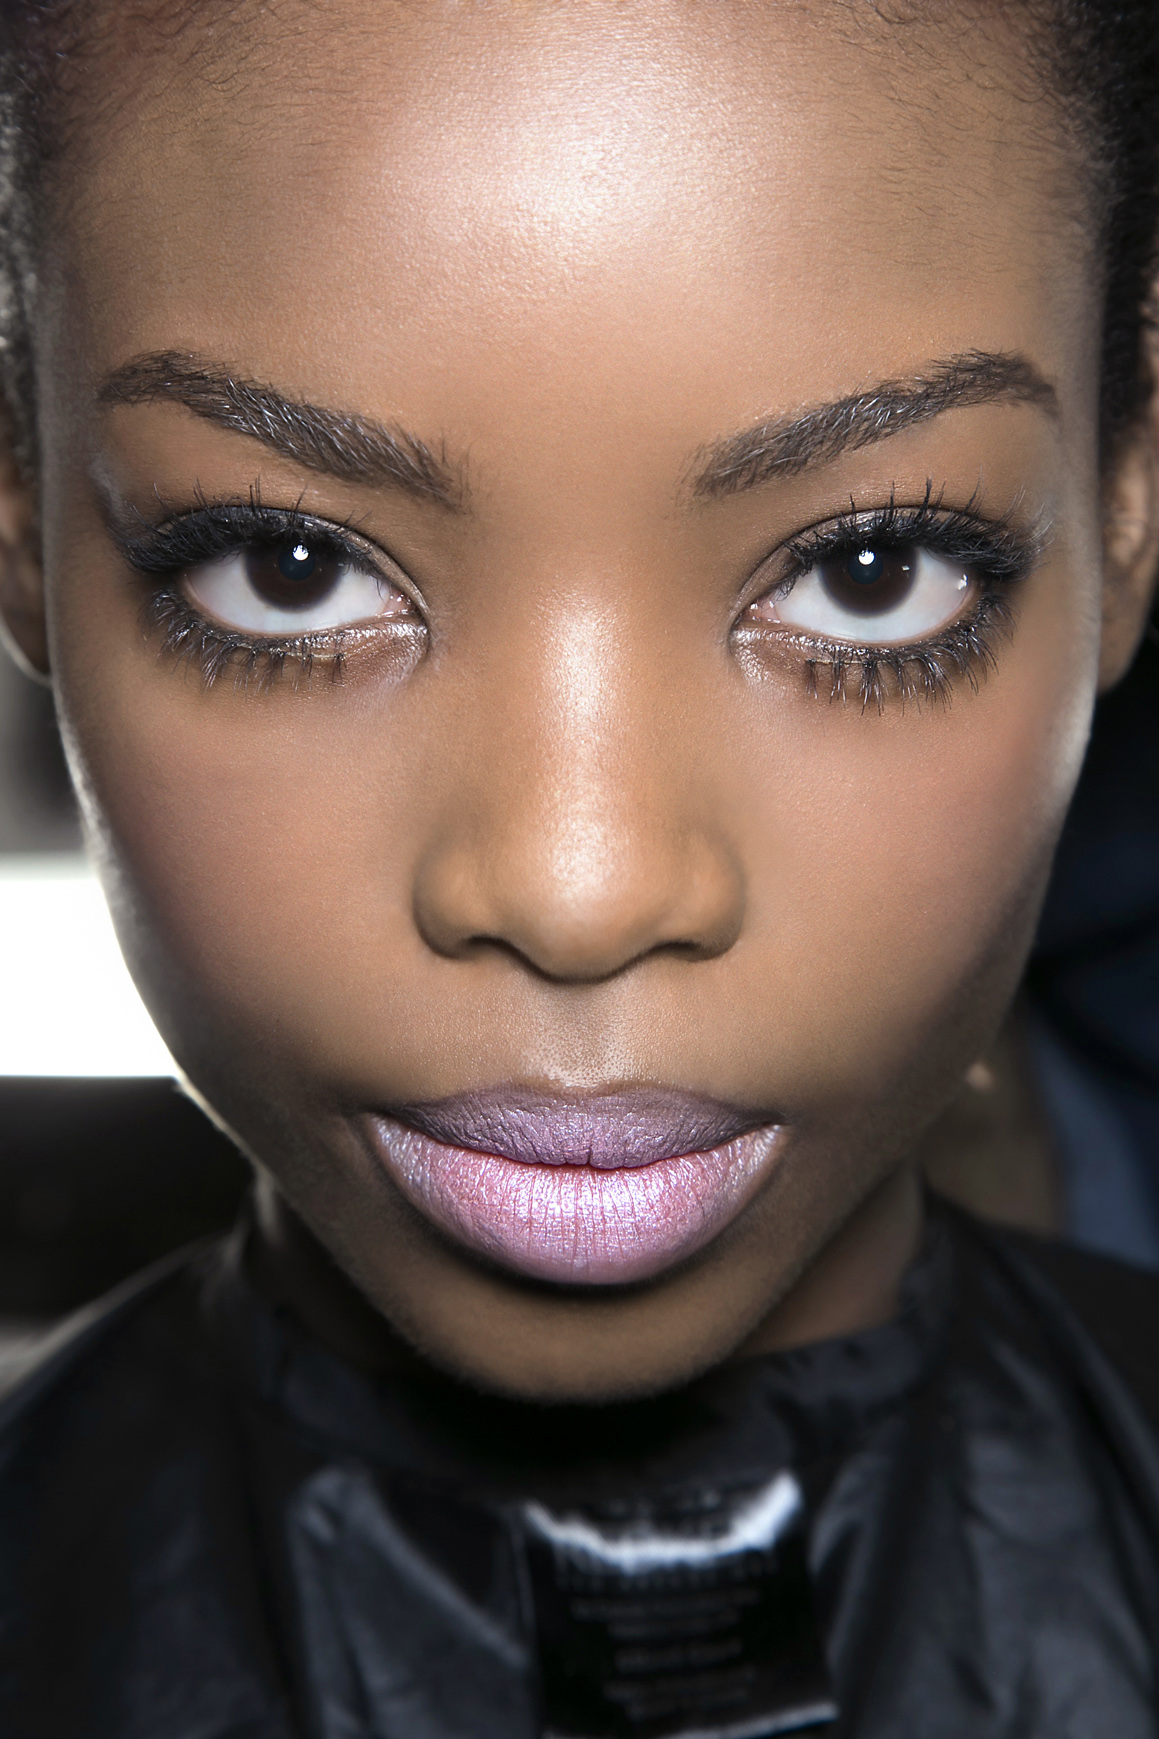 girl wearing pink lipstick and mascara